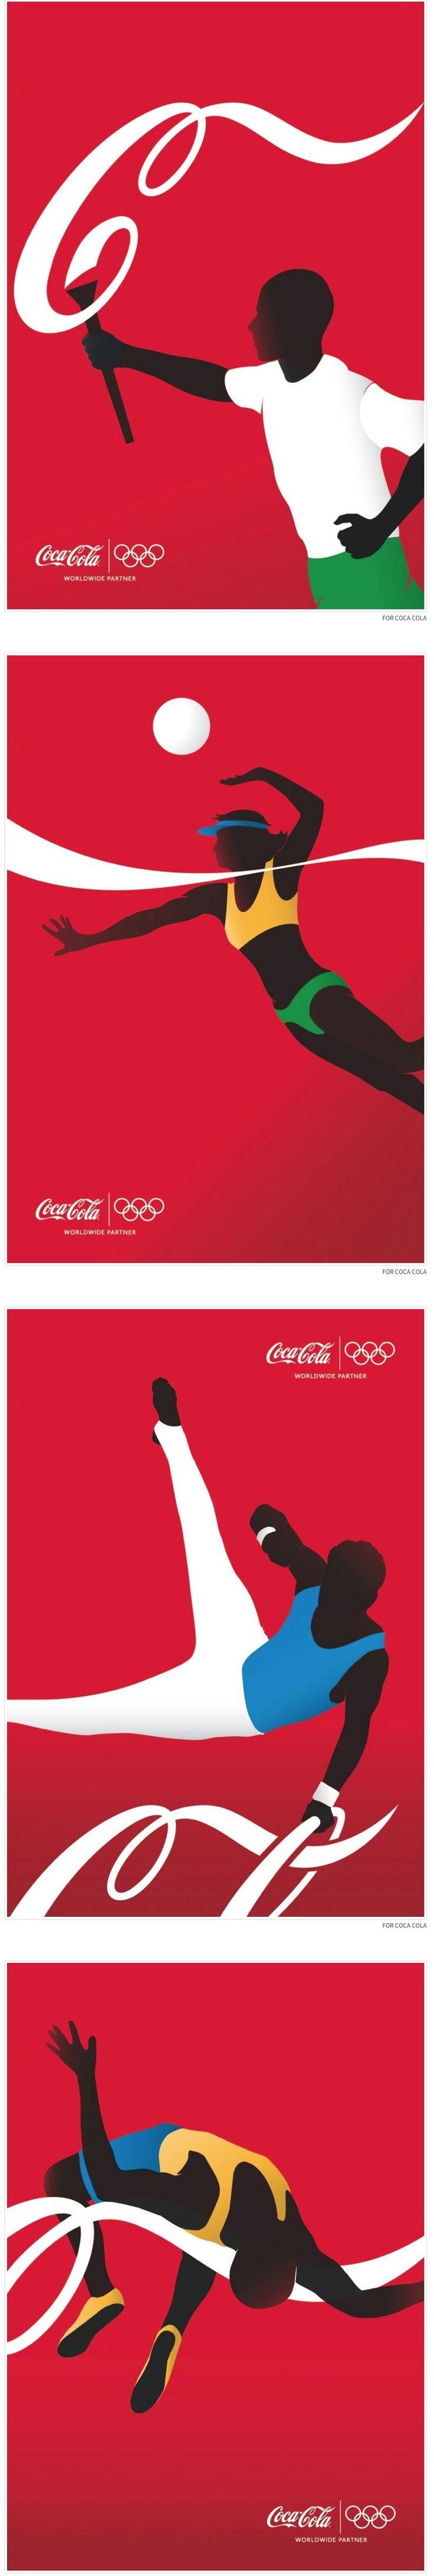 Creative COCA COLA Olympic #Ads #graphic #graphicdesign #design